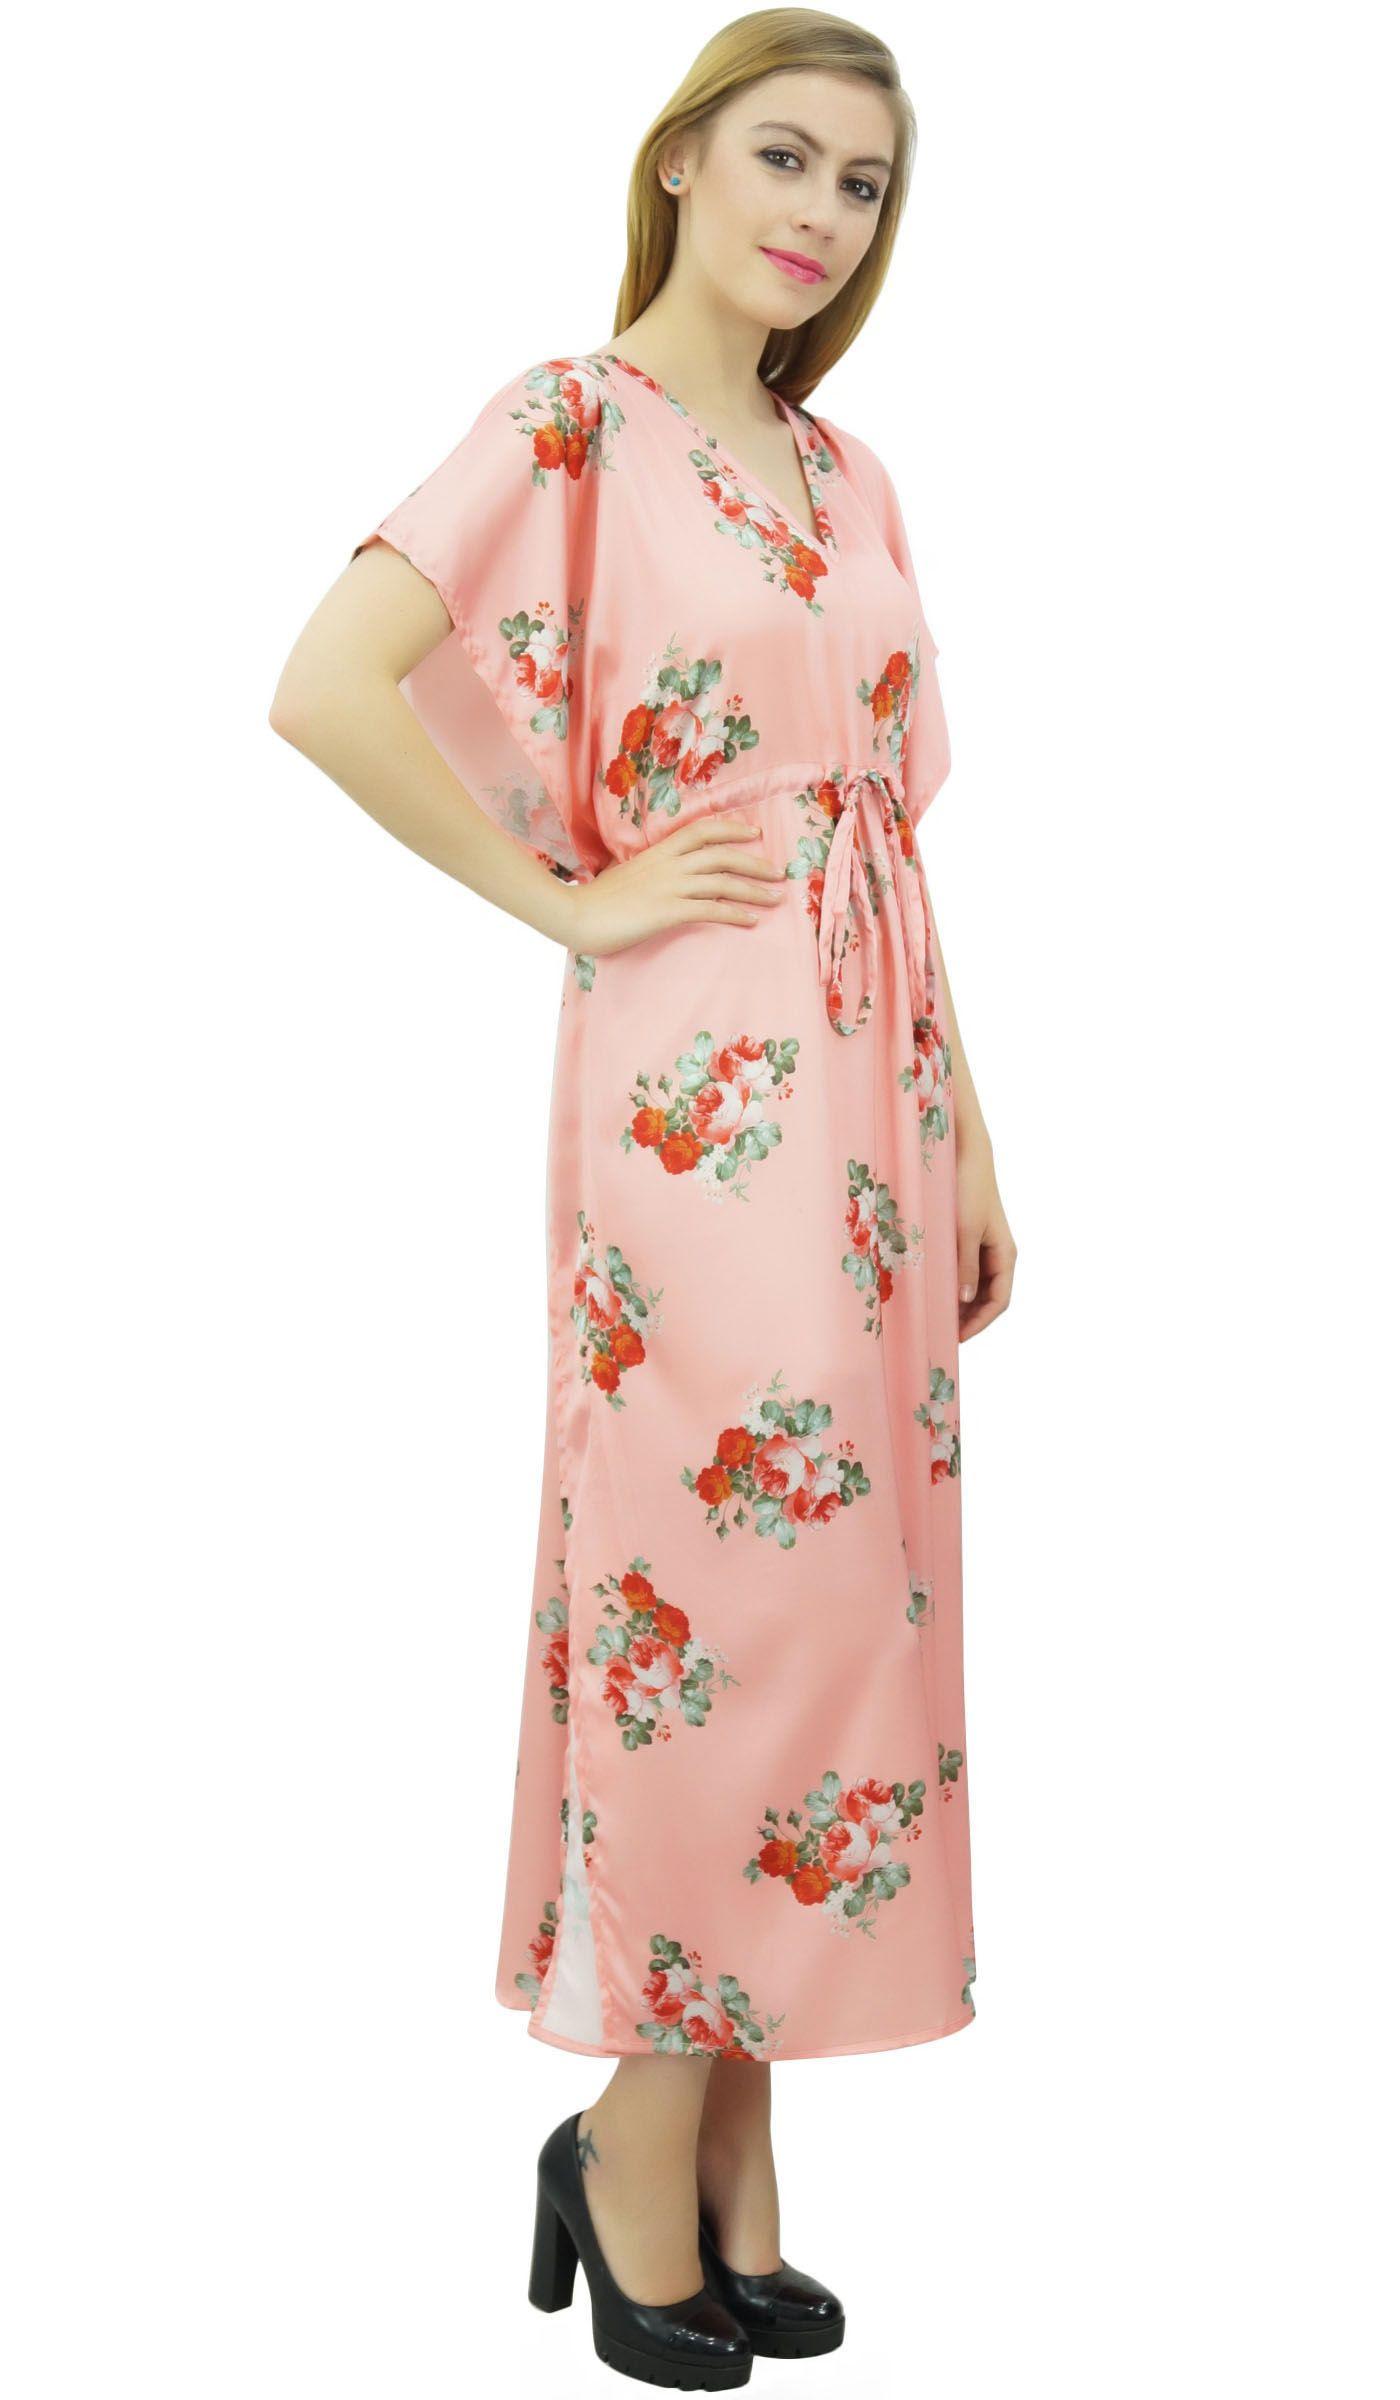 abf19630e1 Bimba Floral Peach Satin Kimono Long Bridesmaid Cover Up Drawstring Kaftan  Satin Kimono